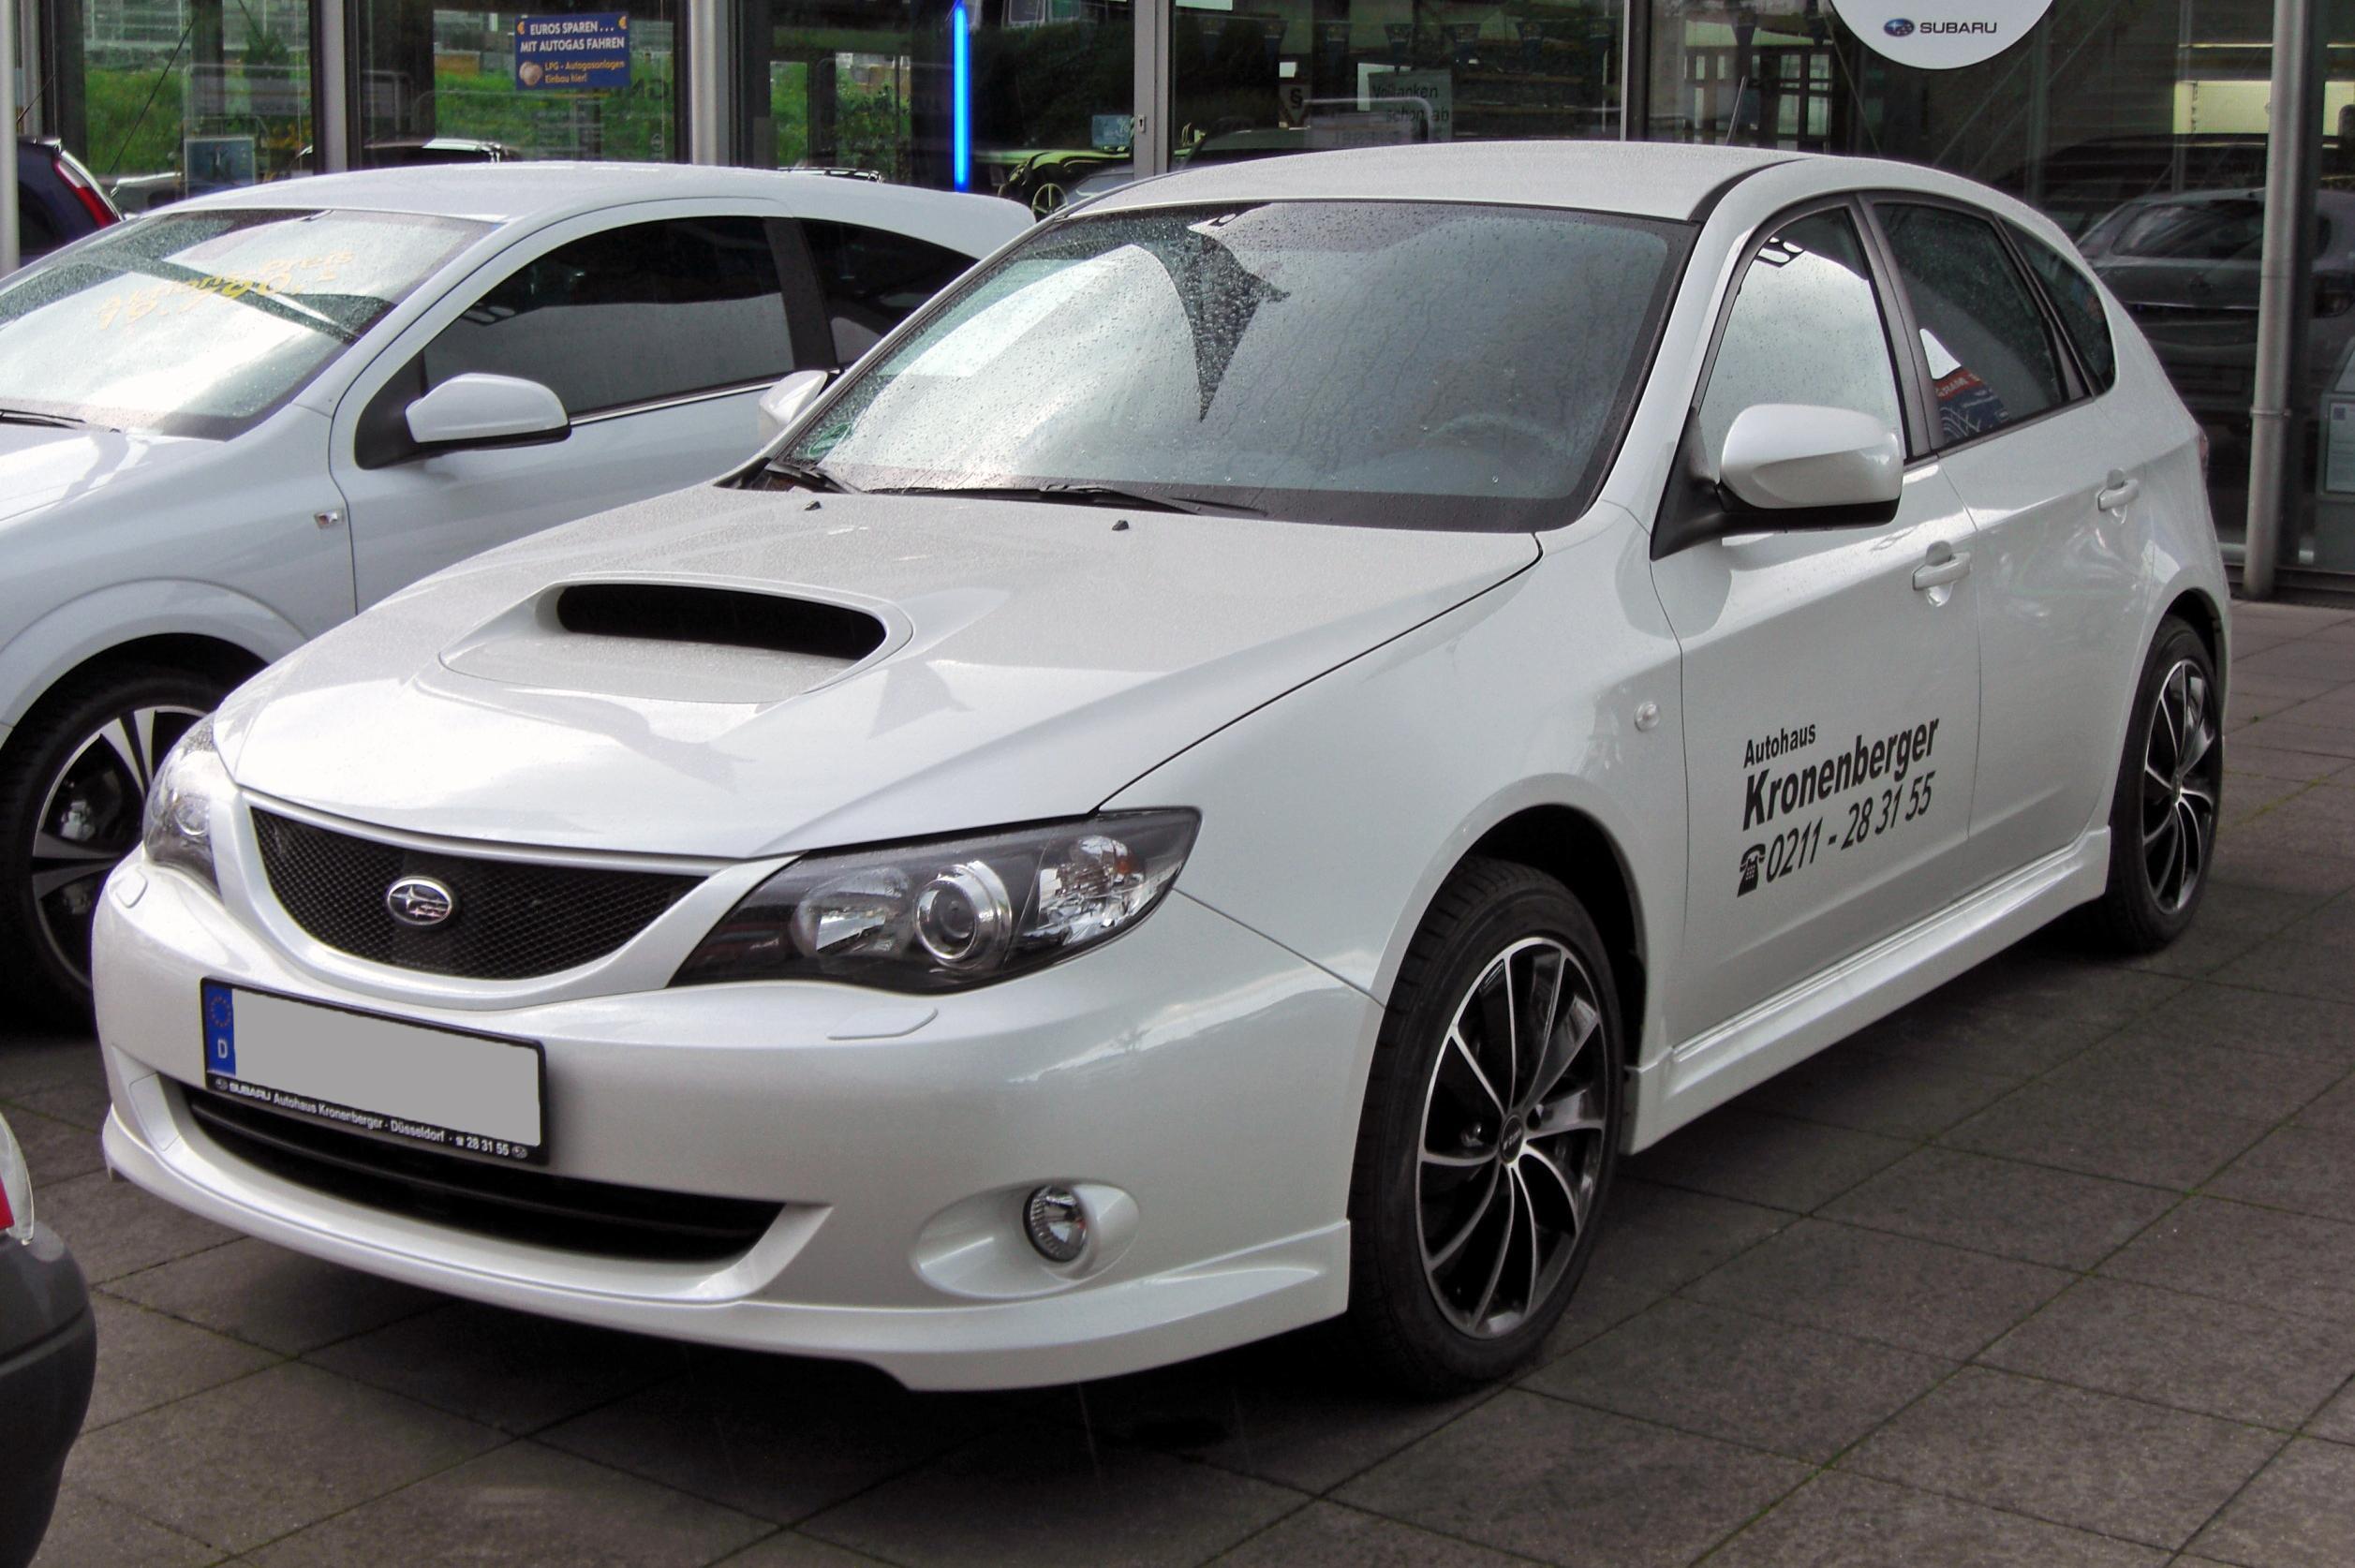 2009 Subaru Impreza 2 0D RC 5 door hatchback with air con alloys